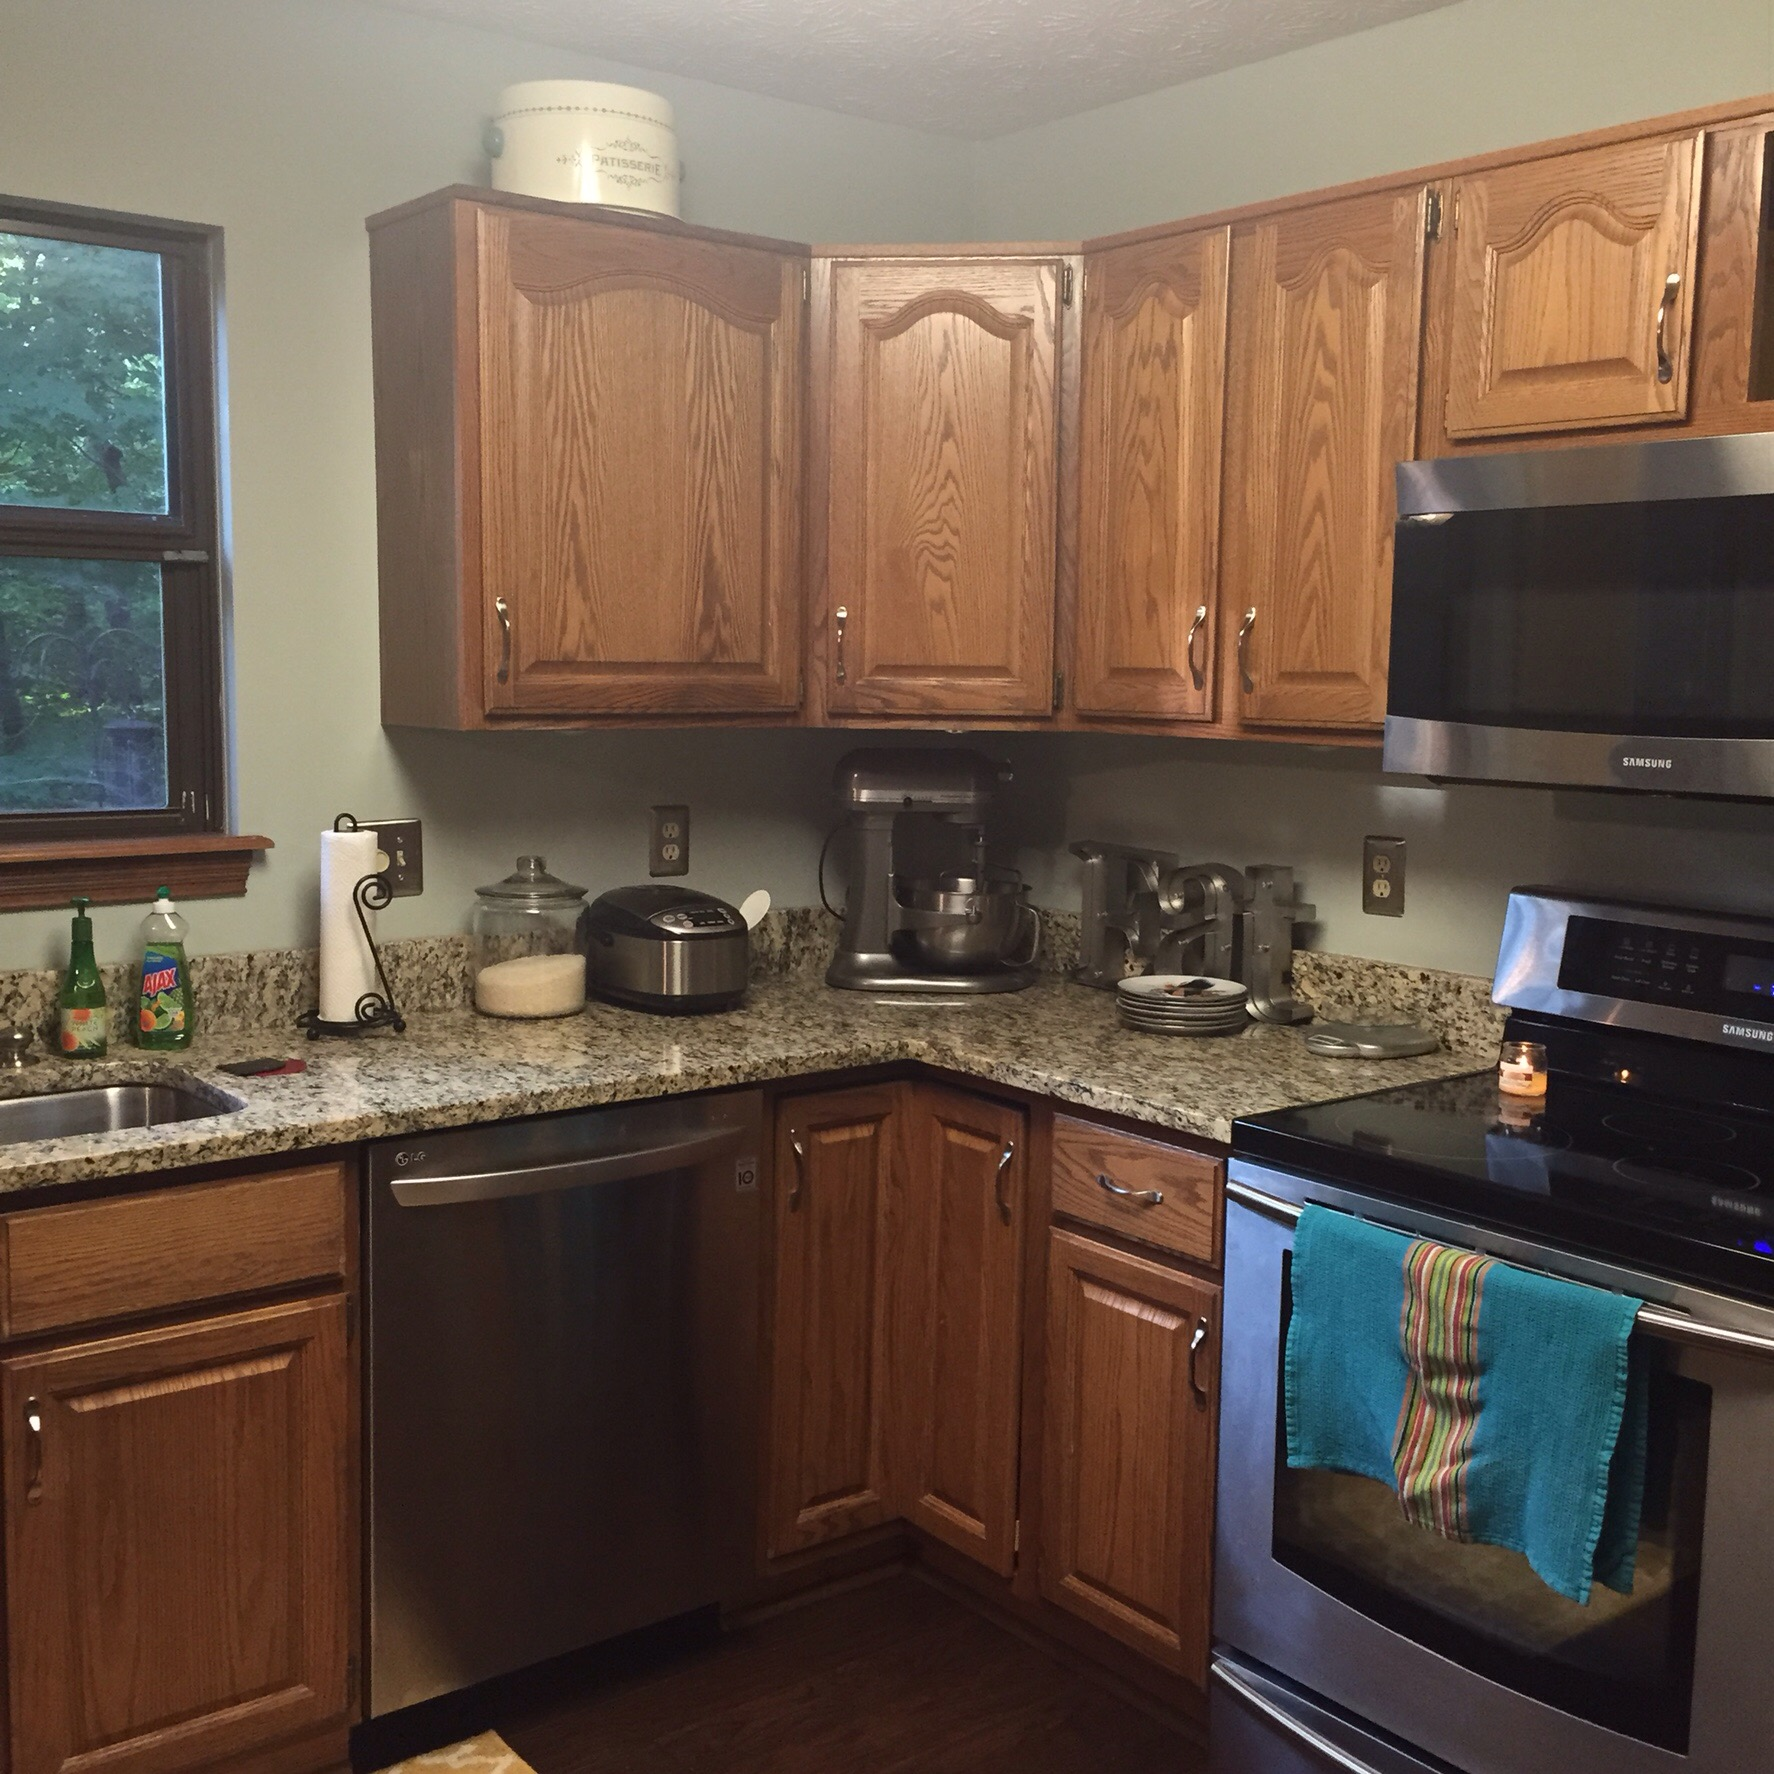 Rustoleum Cabinet Transformations Reviews | Rustoleum Transformation Colors | Rustoleum Kitchen Cabinet Kit Reviews